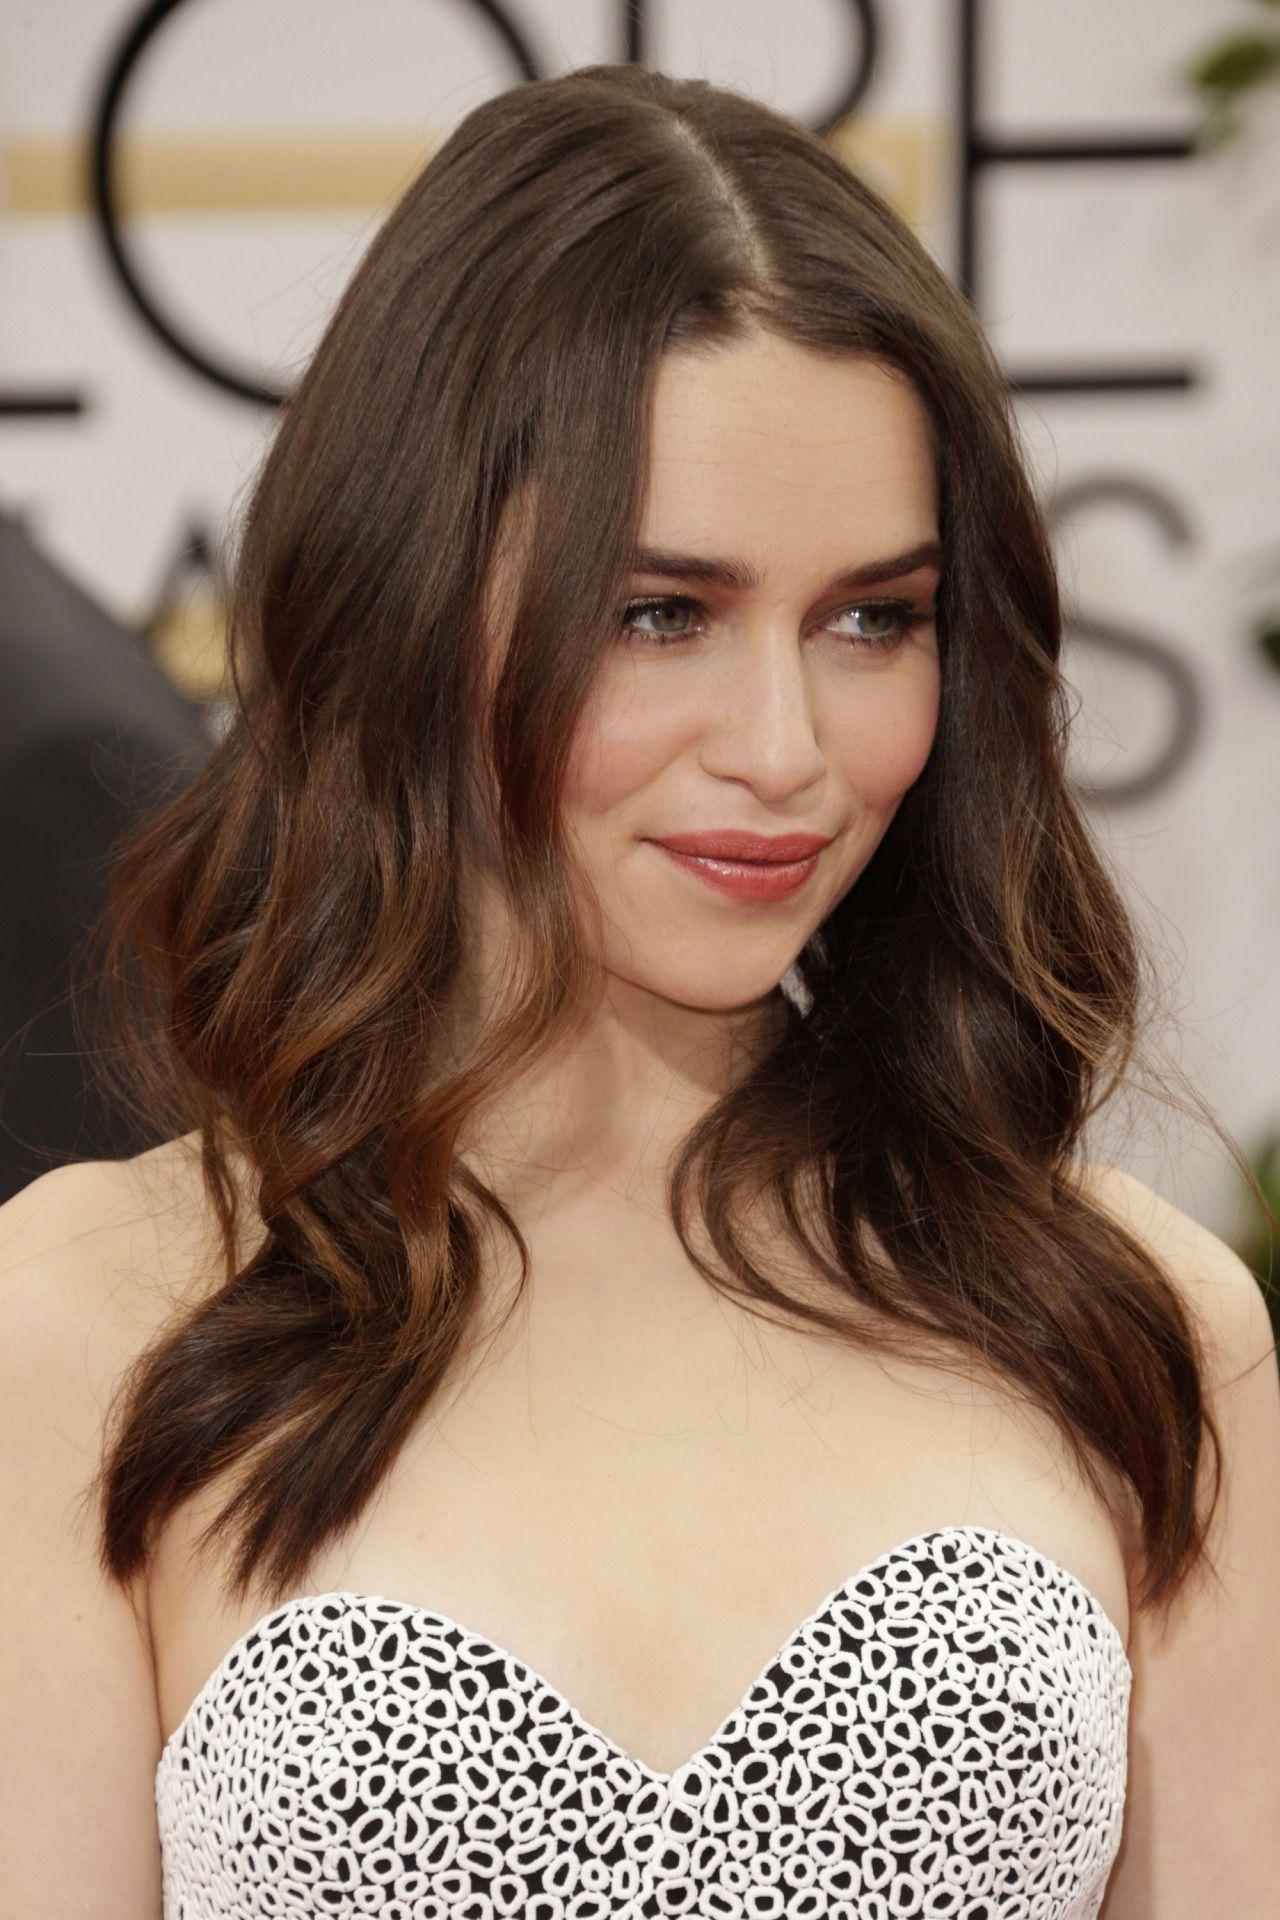 Colonelsnollygoster Beauty Emilia Clarke Emilia Clarke Hot